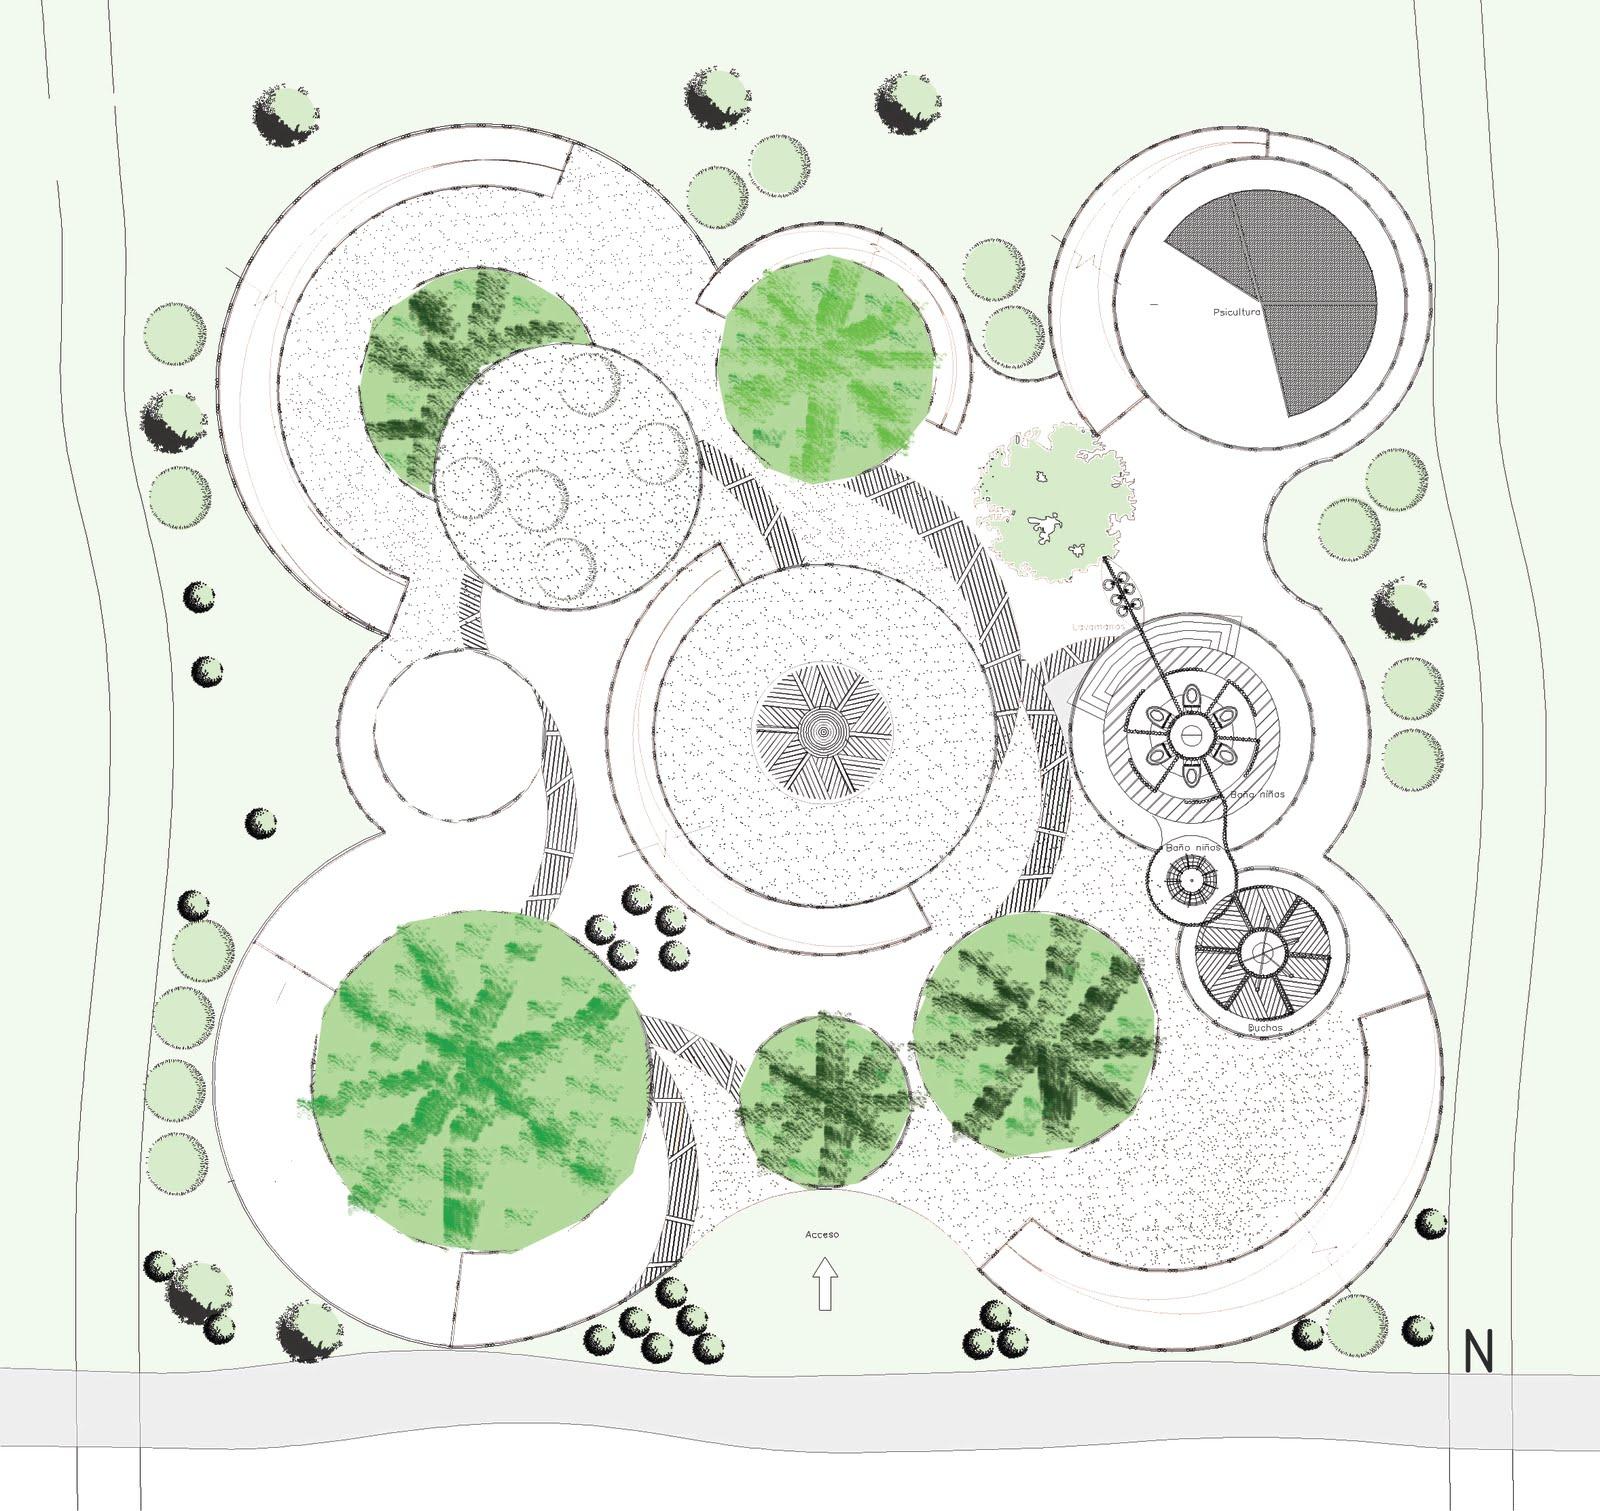 Setas novogranatense planta arquitect nica an lisis for Planta arquitectonica biblioteca